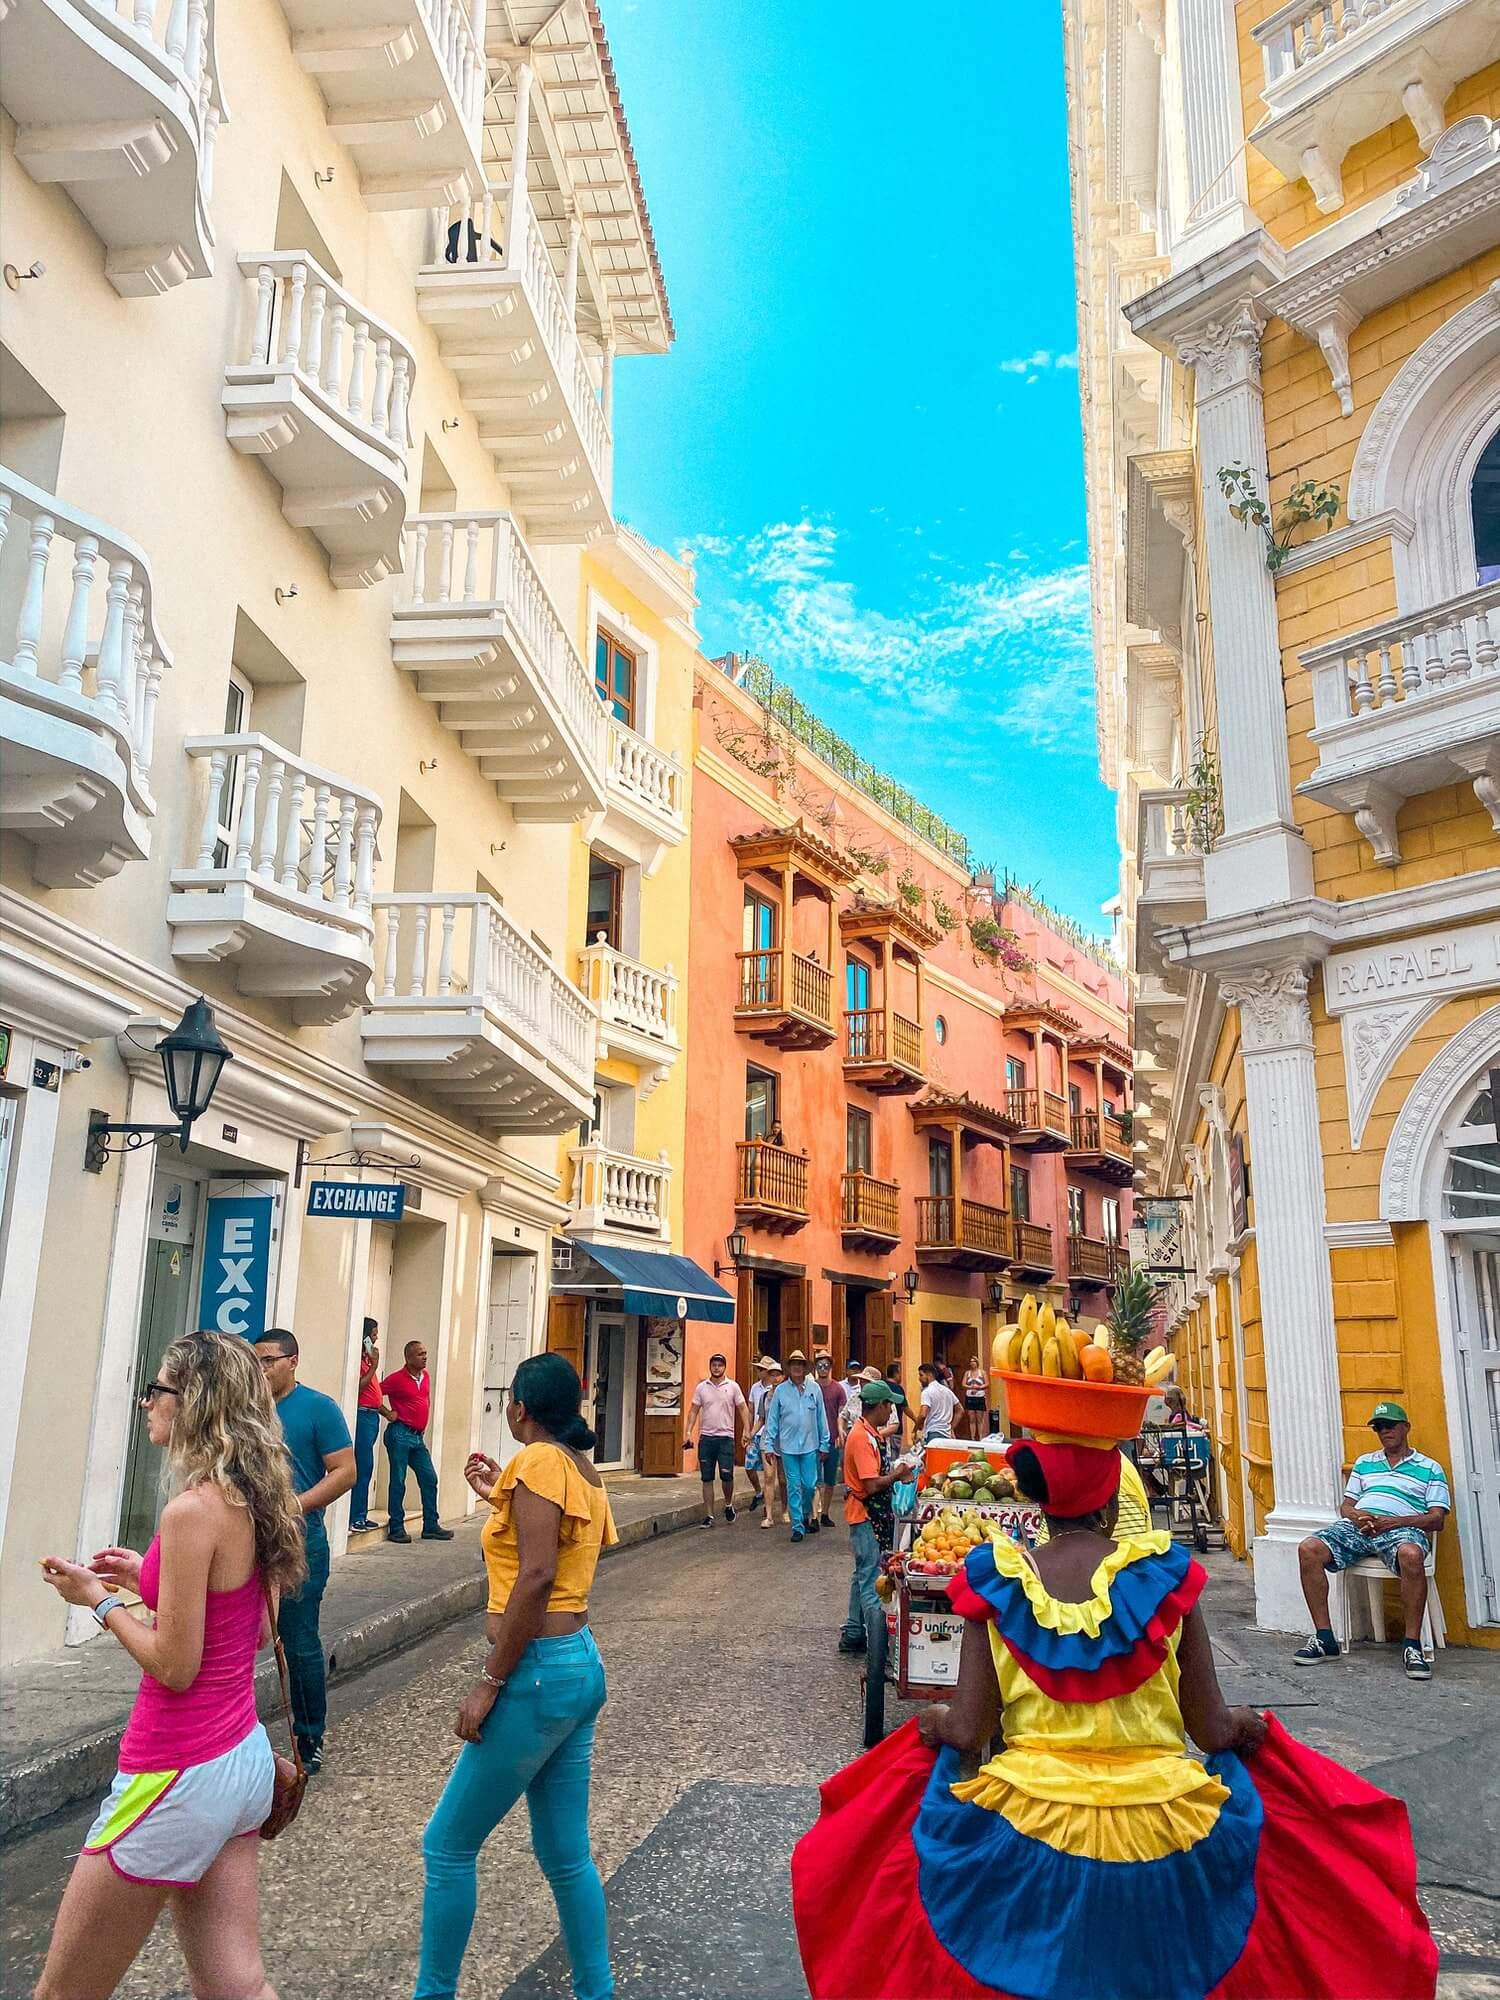 Street life of Cartagena